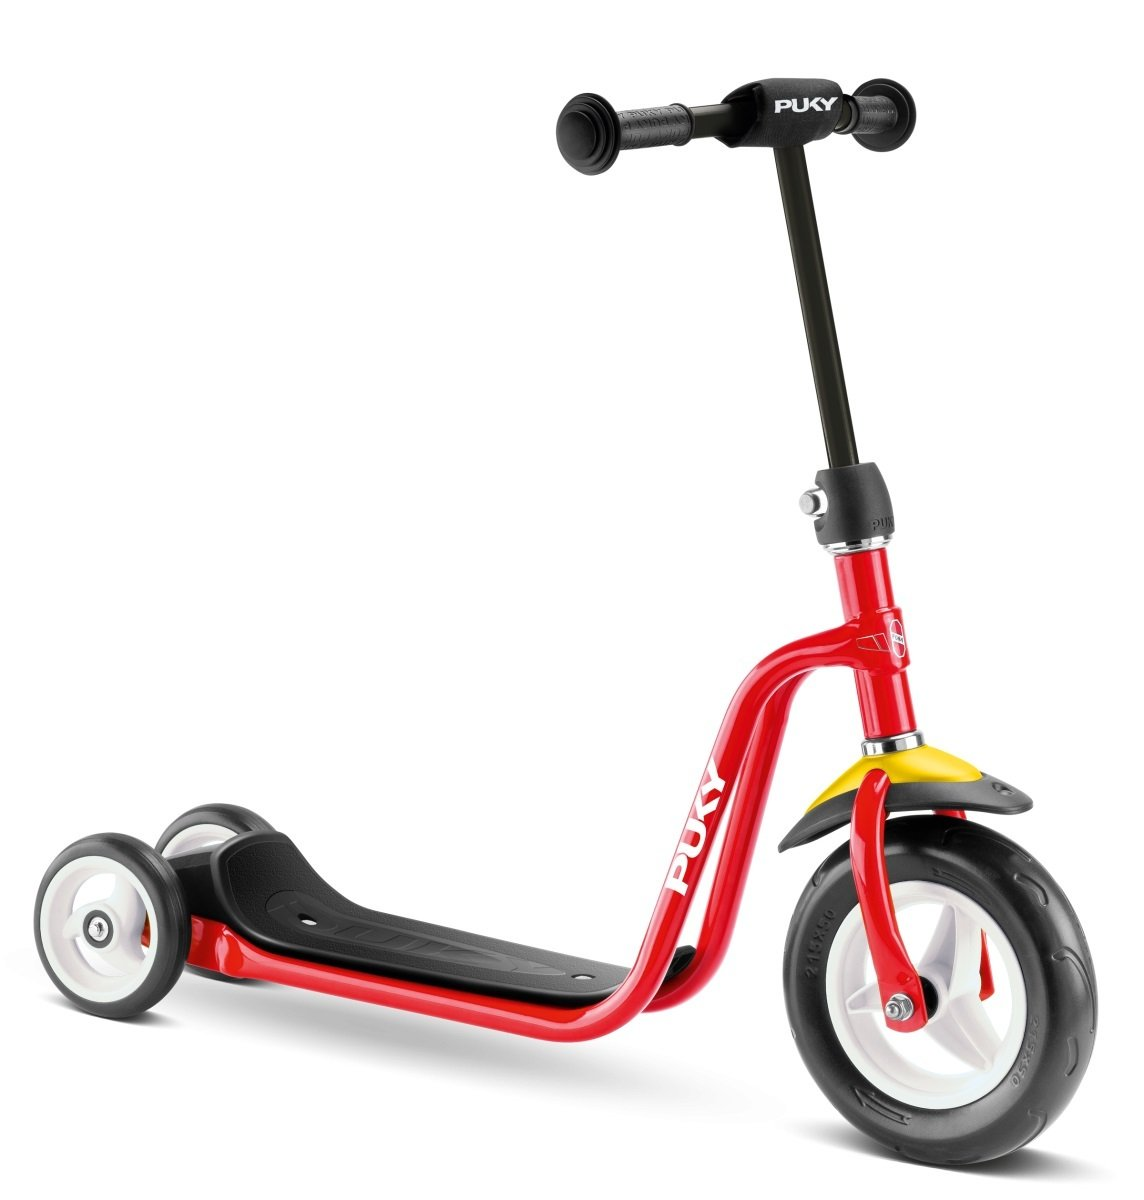 PUKY Kolobežka Scooter R 1 Red New